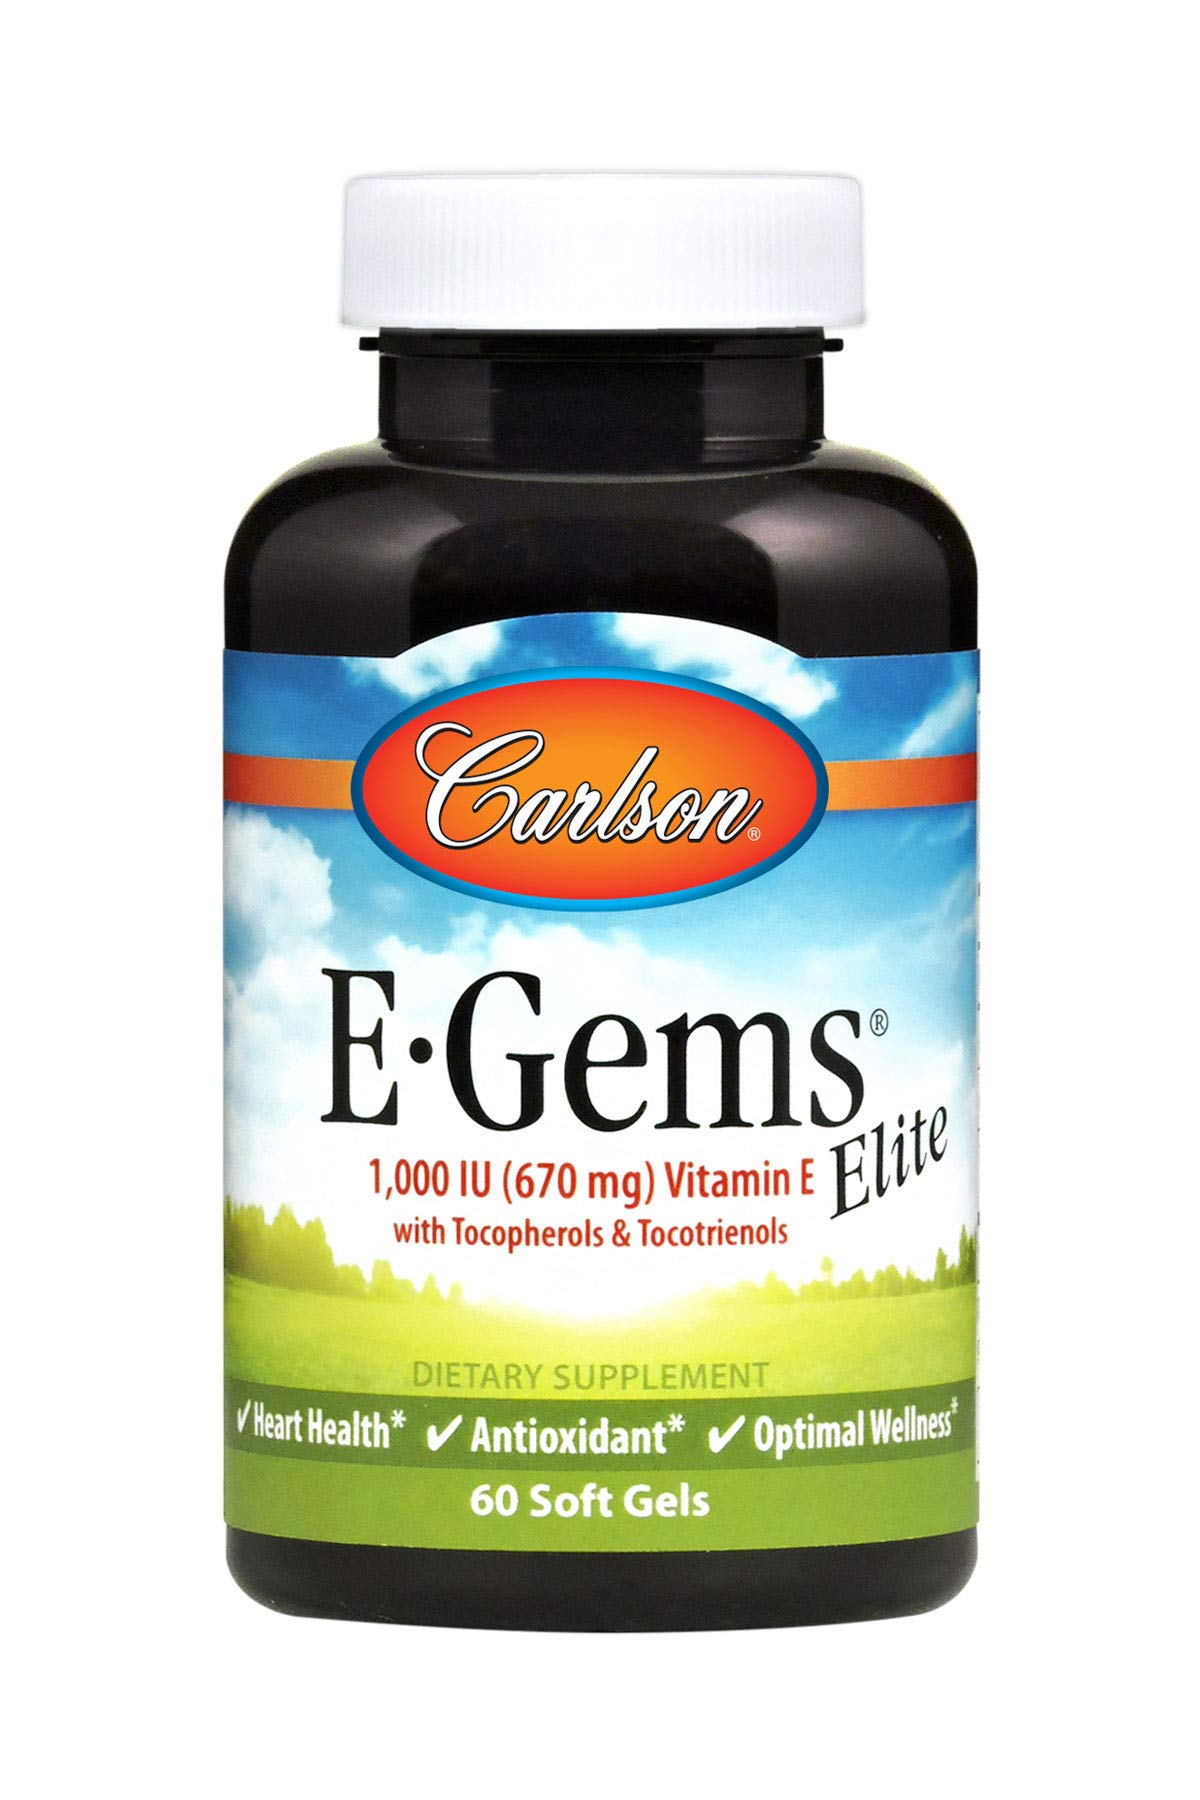 Carlson - E-Gems Elite, 1000 IU Vitamin E with Tocopherols & Tocotrienols, Heart Health & Optimal Wellness, Antioxidant, 60 Soft gels